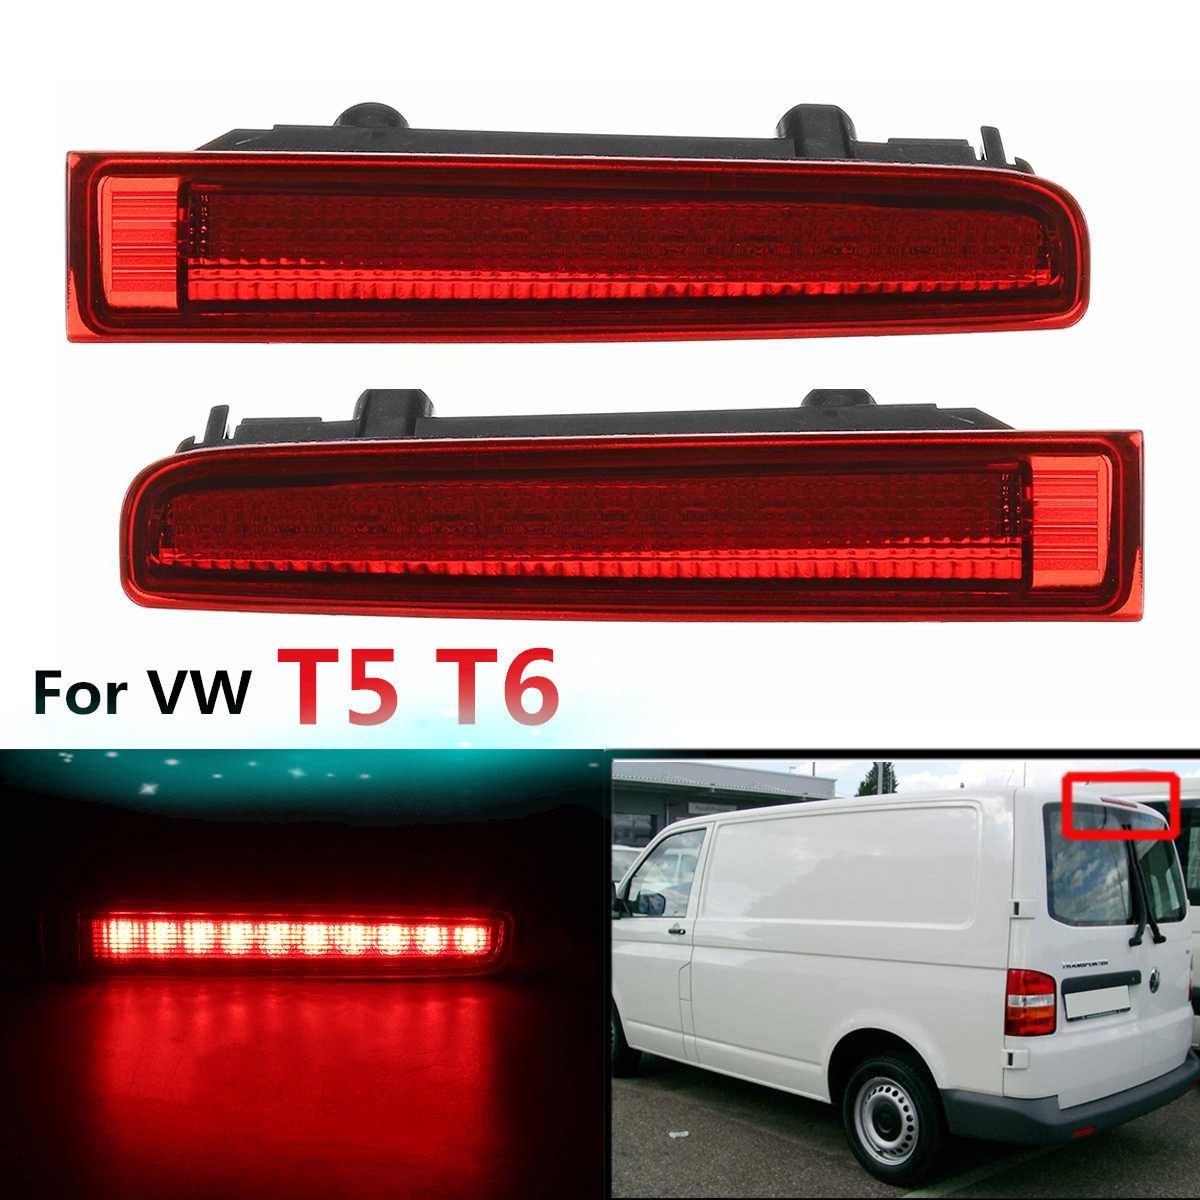 1338 Brake Light LED Auto Replacement High Power Universal Panel Stop Light